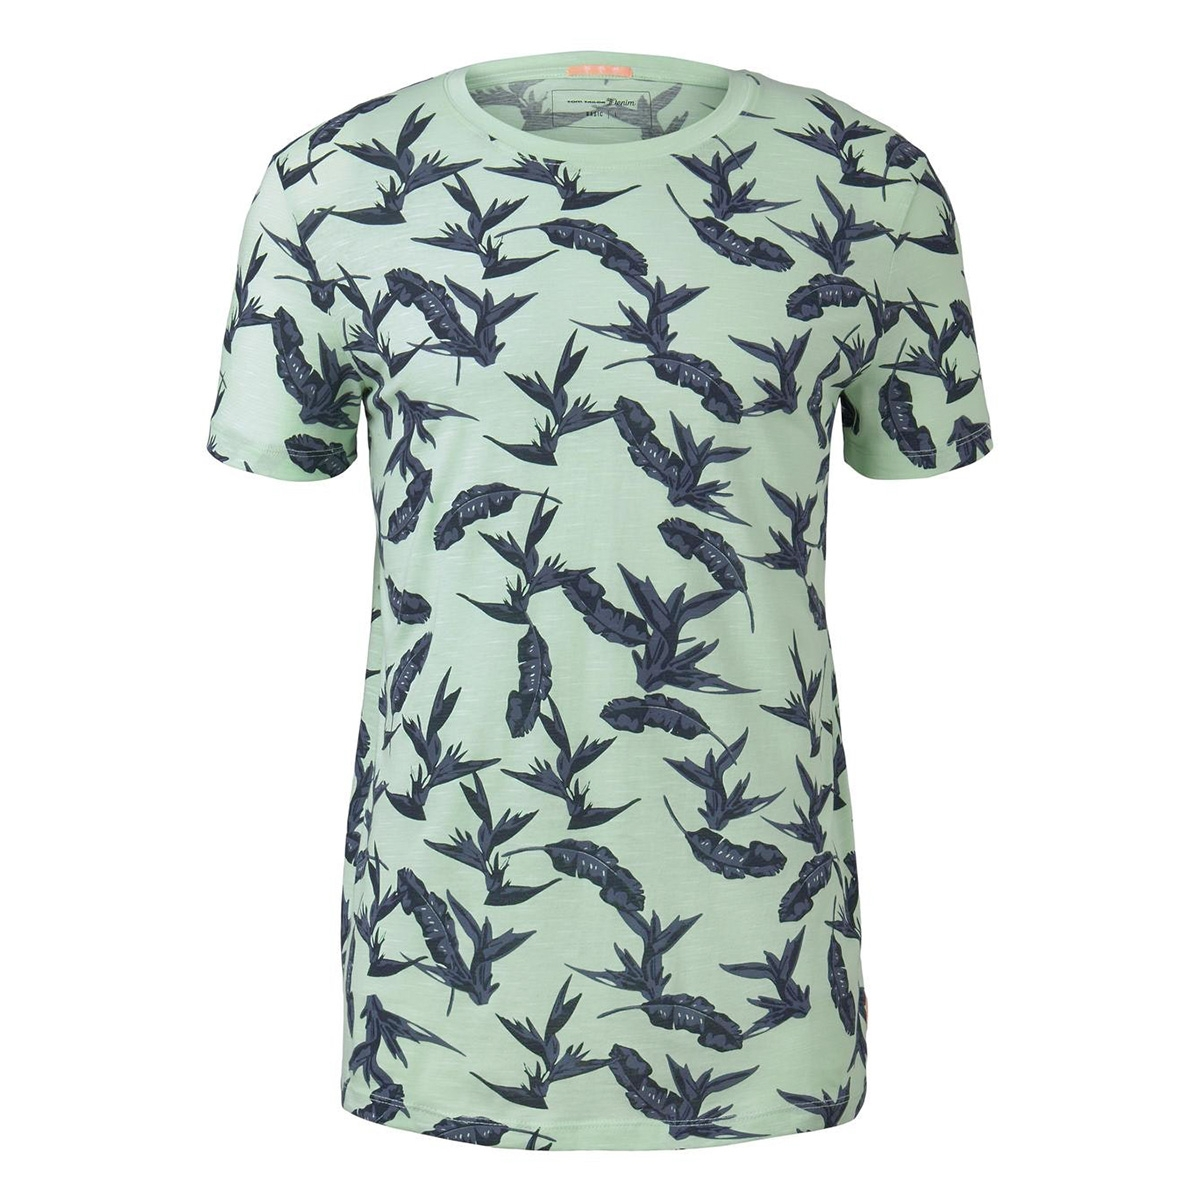 t shirt met all over print 1019088xx12 tom tailor t-shirt 23124